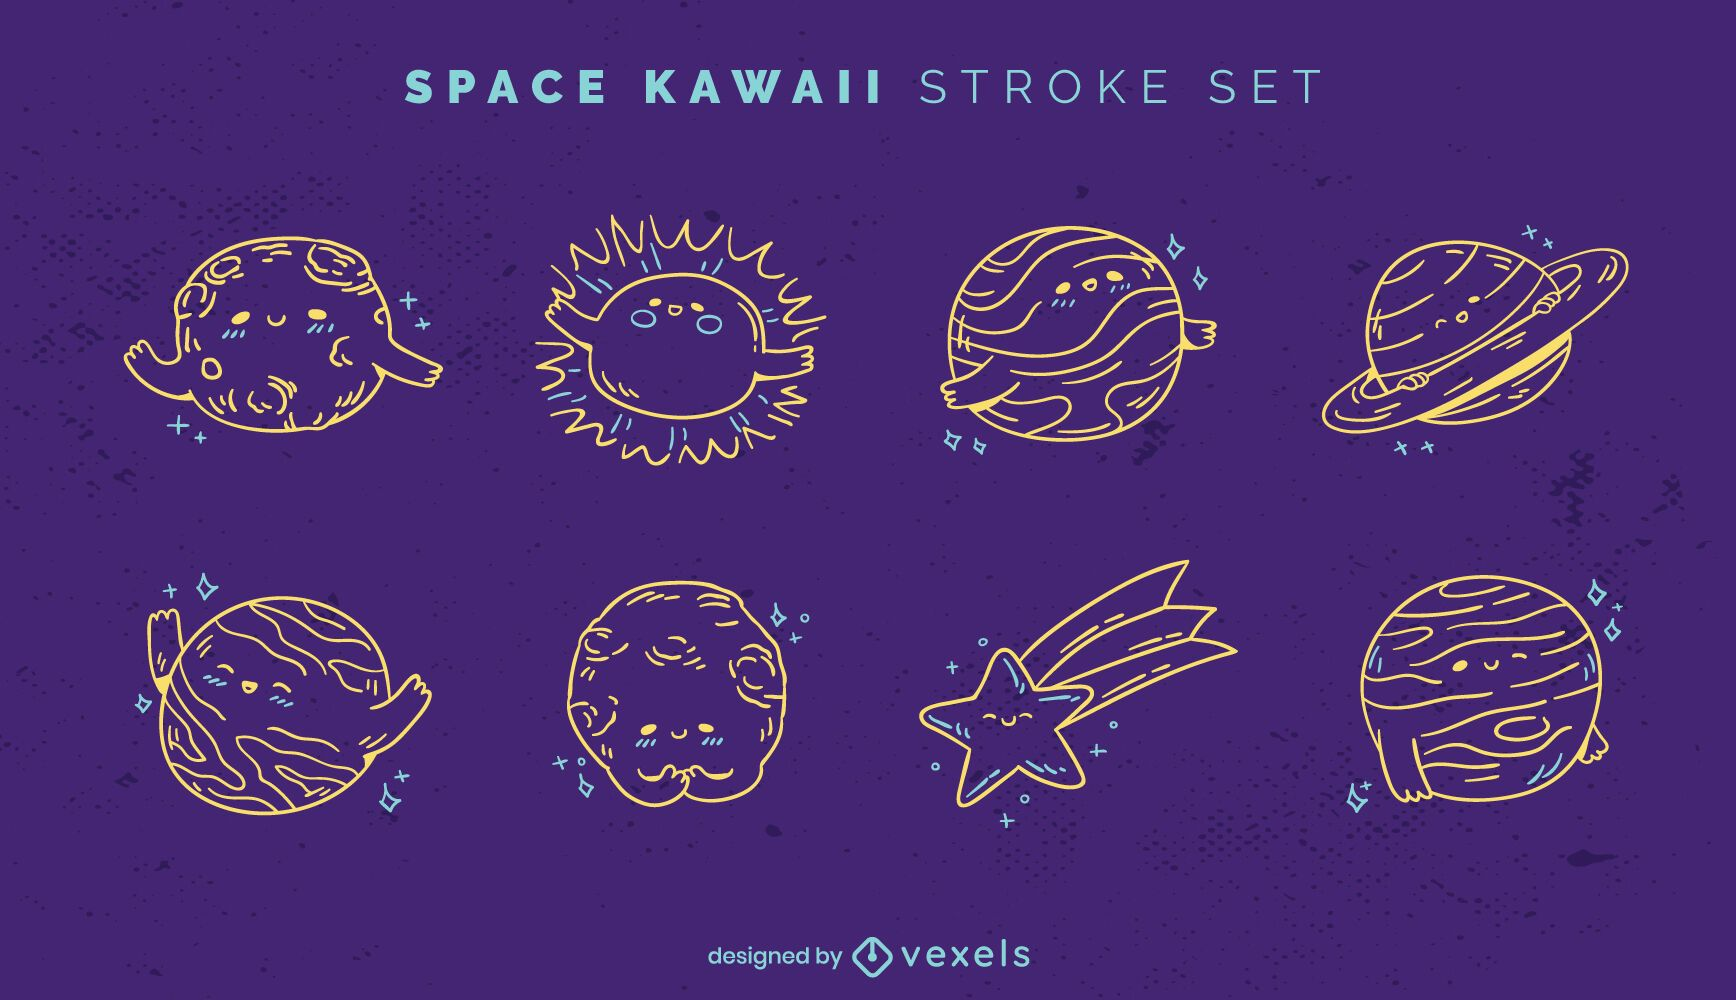 Kawaii space stroke set